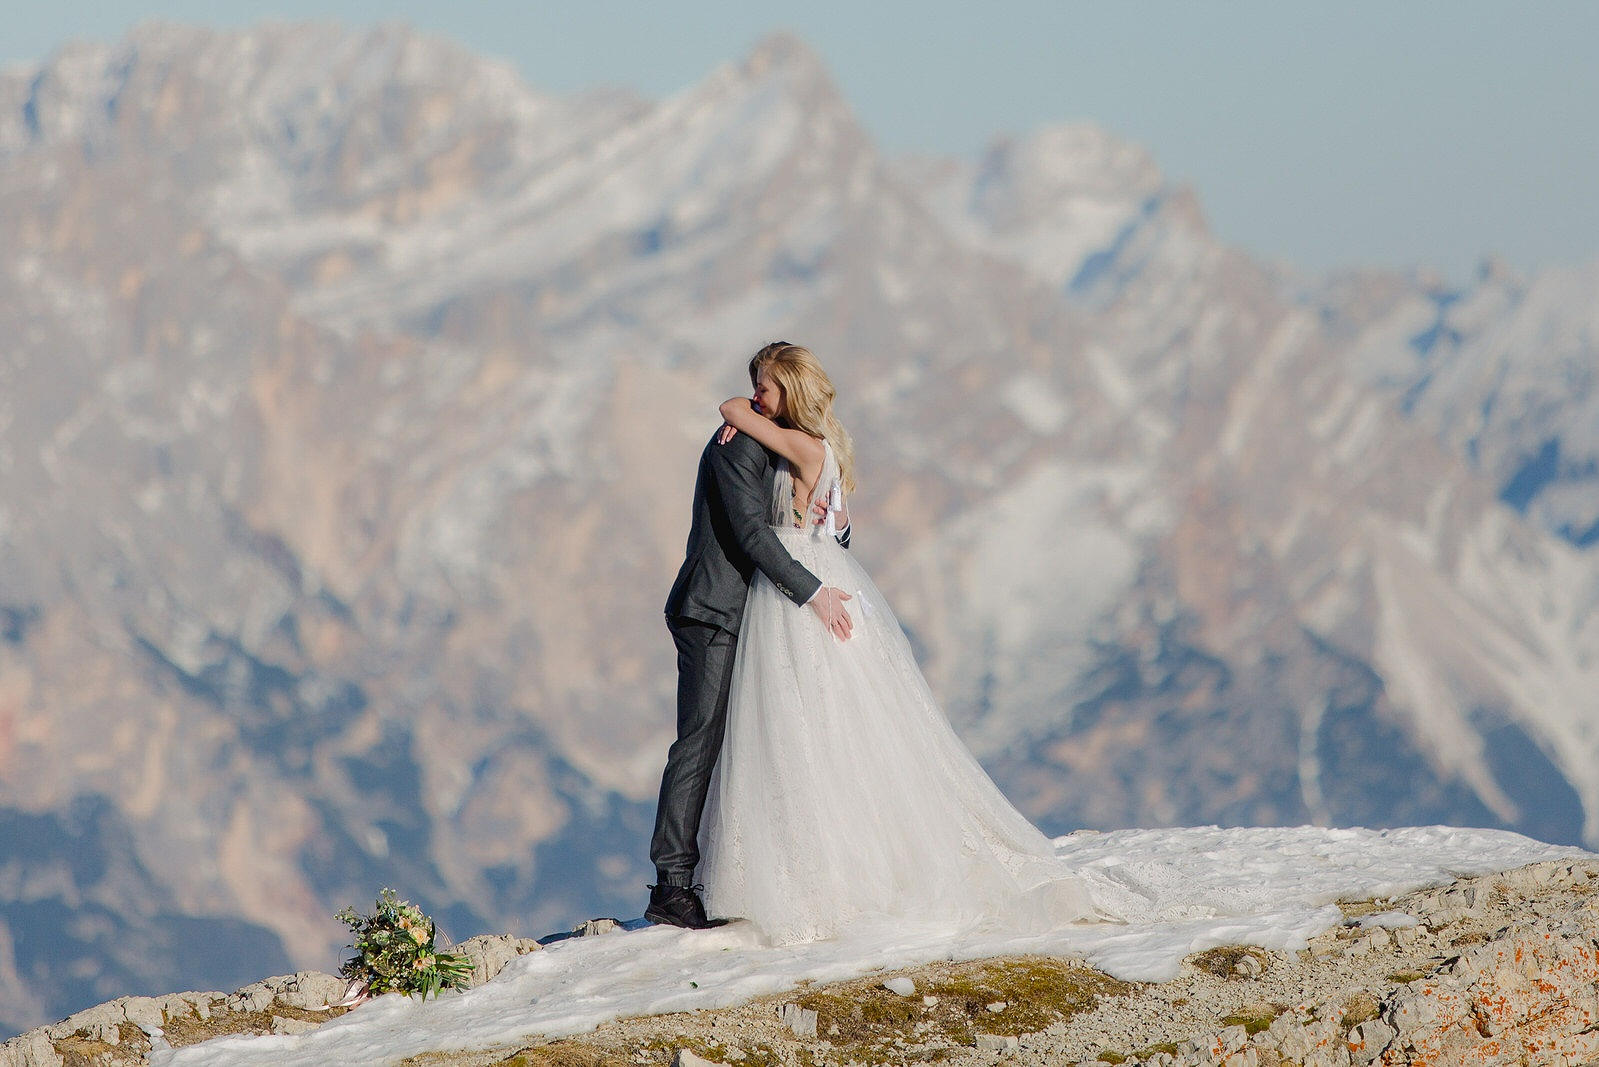 Adventurous+Dolomites+Elopement+Wedding+Fotomagoria29.jpg